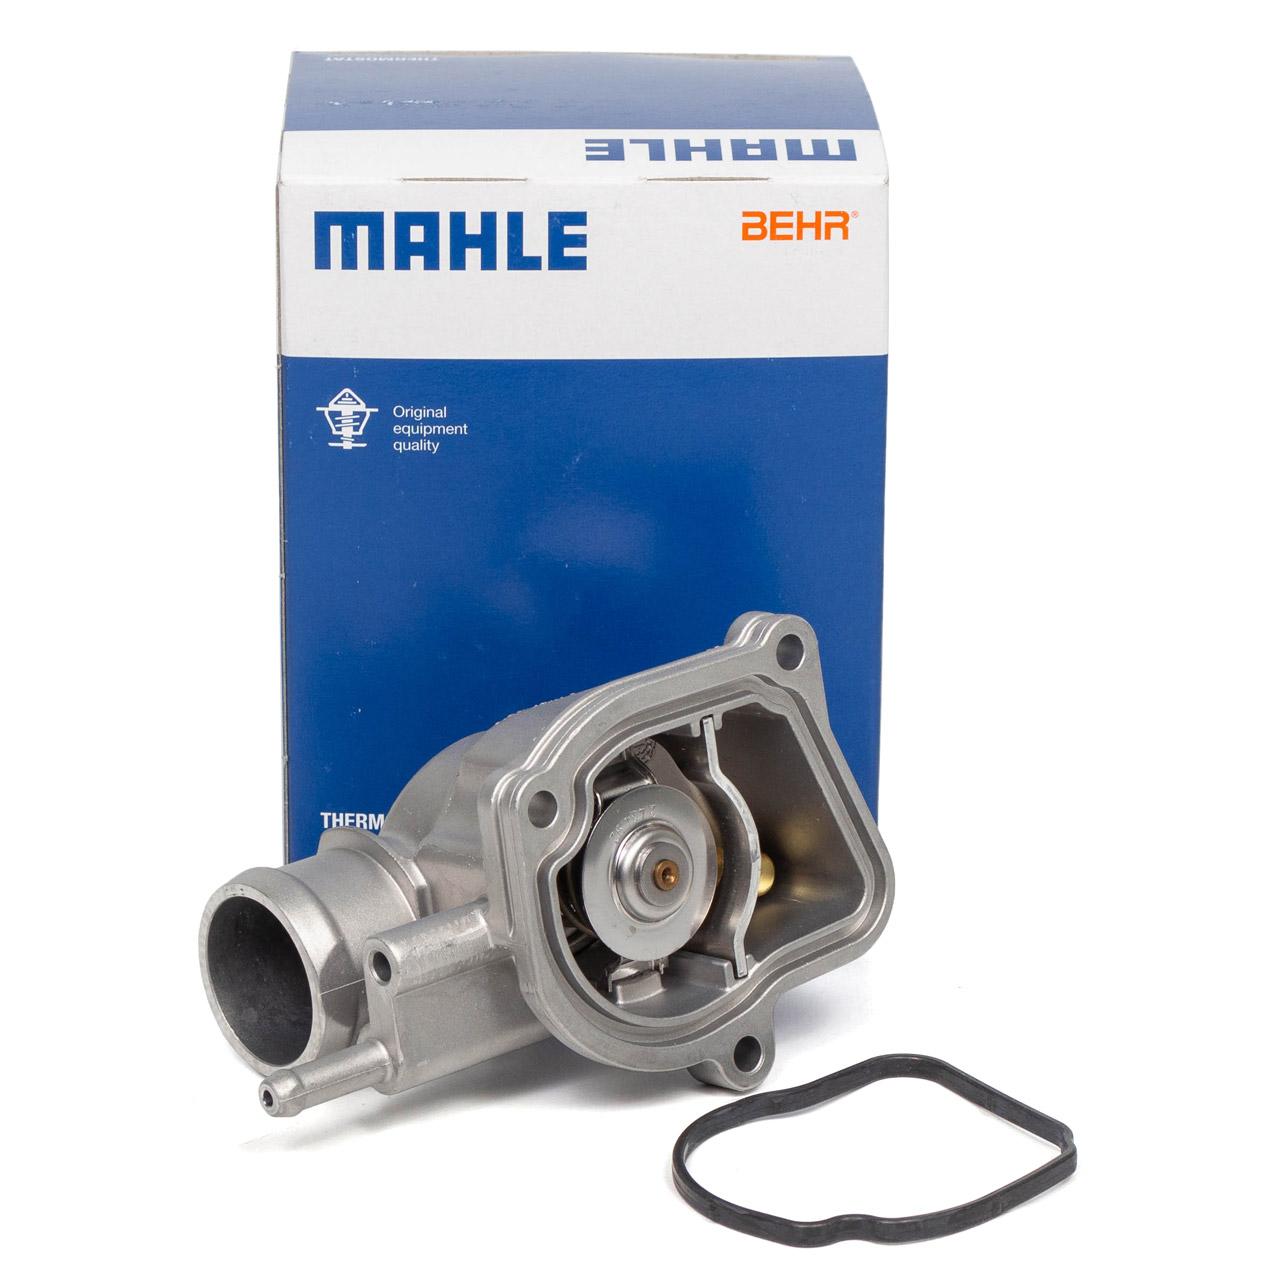 BEHR / MAHLE TI3192 Thermostat MERCEDES W203 W204 200/220CDI W211 200-320CDI W220